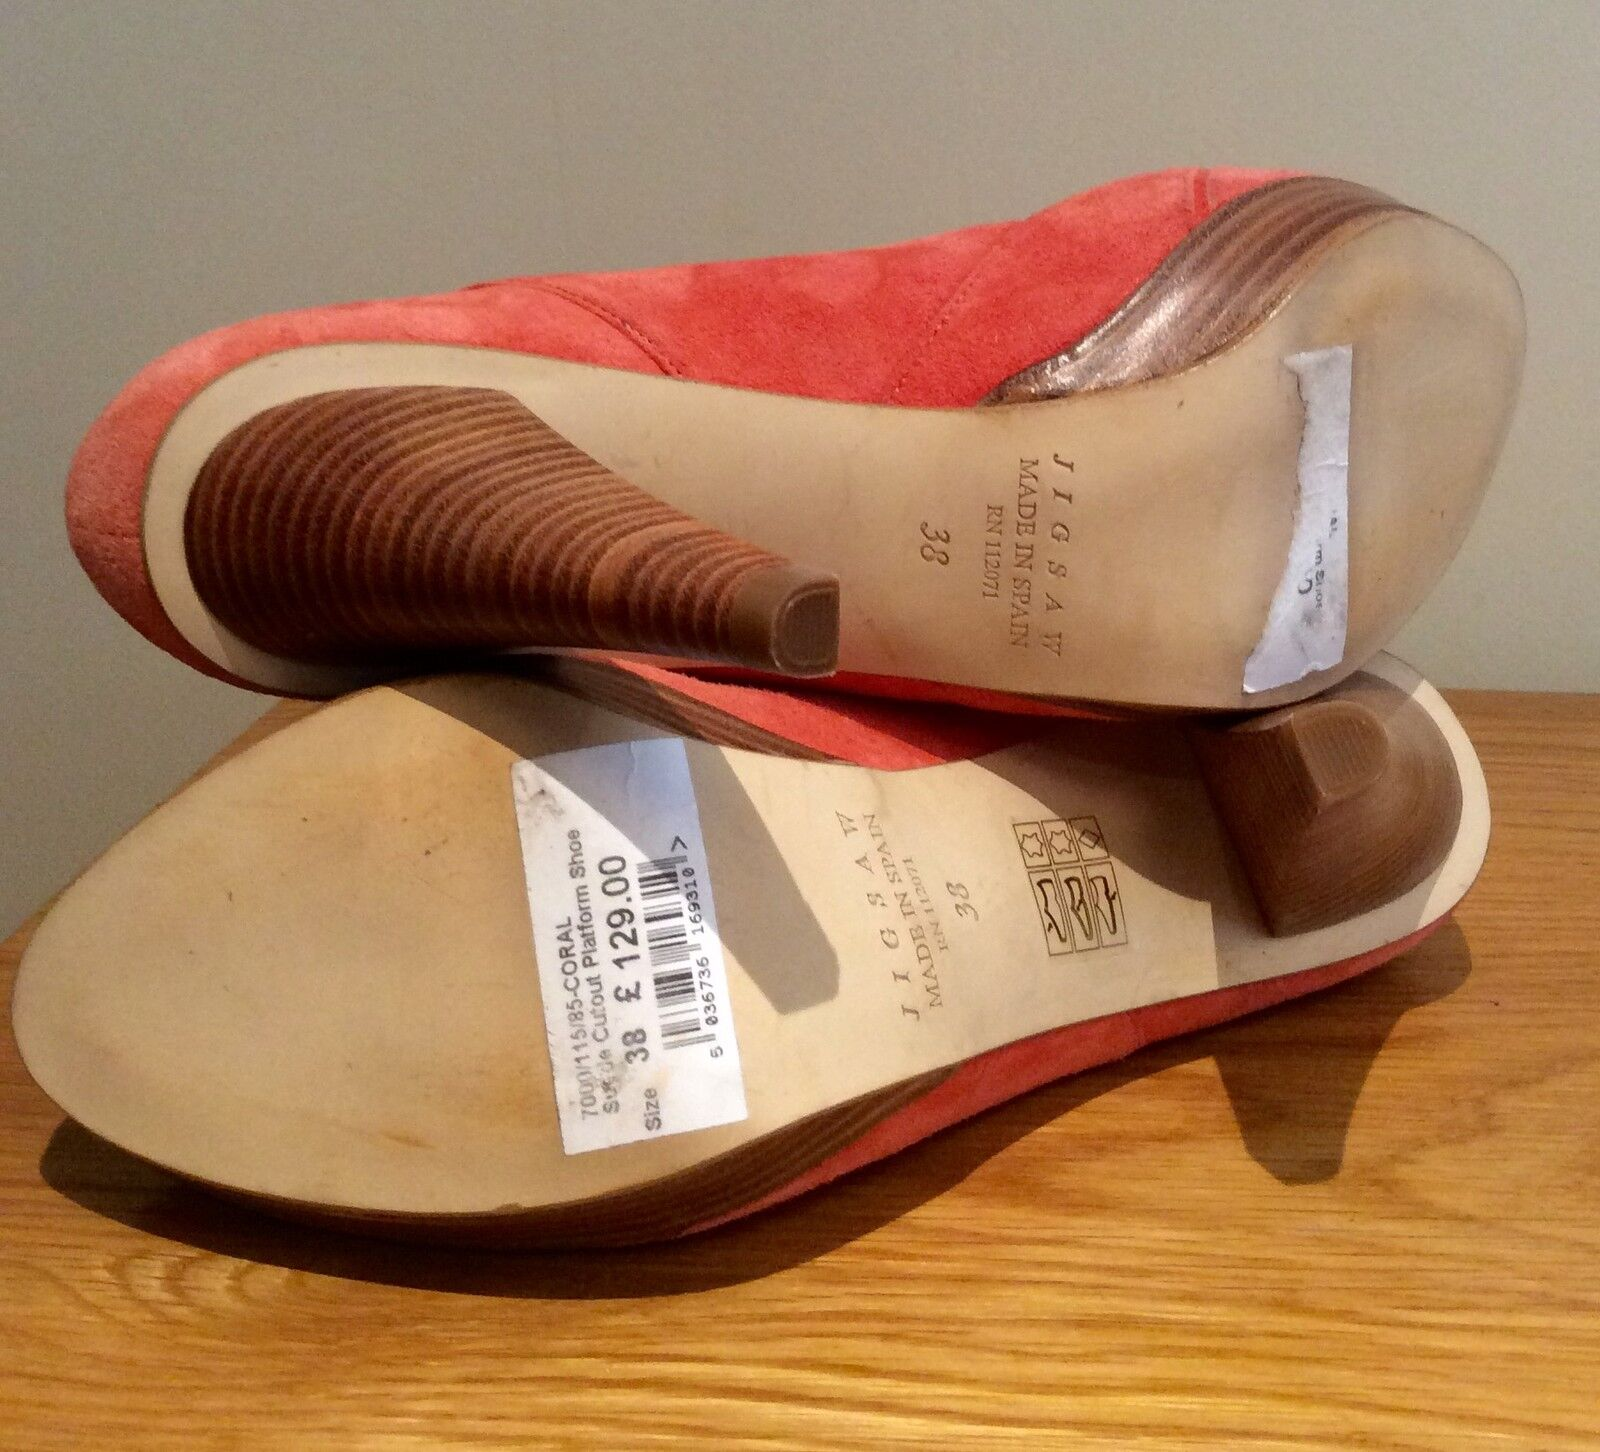 JIGSAW Schuhe 38    SIZE 38 Schuhe UK 5 CORAL SUEDE LEATHER CUTOUT HEELS PLATFORM c15ffc